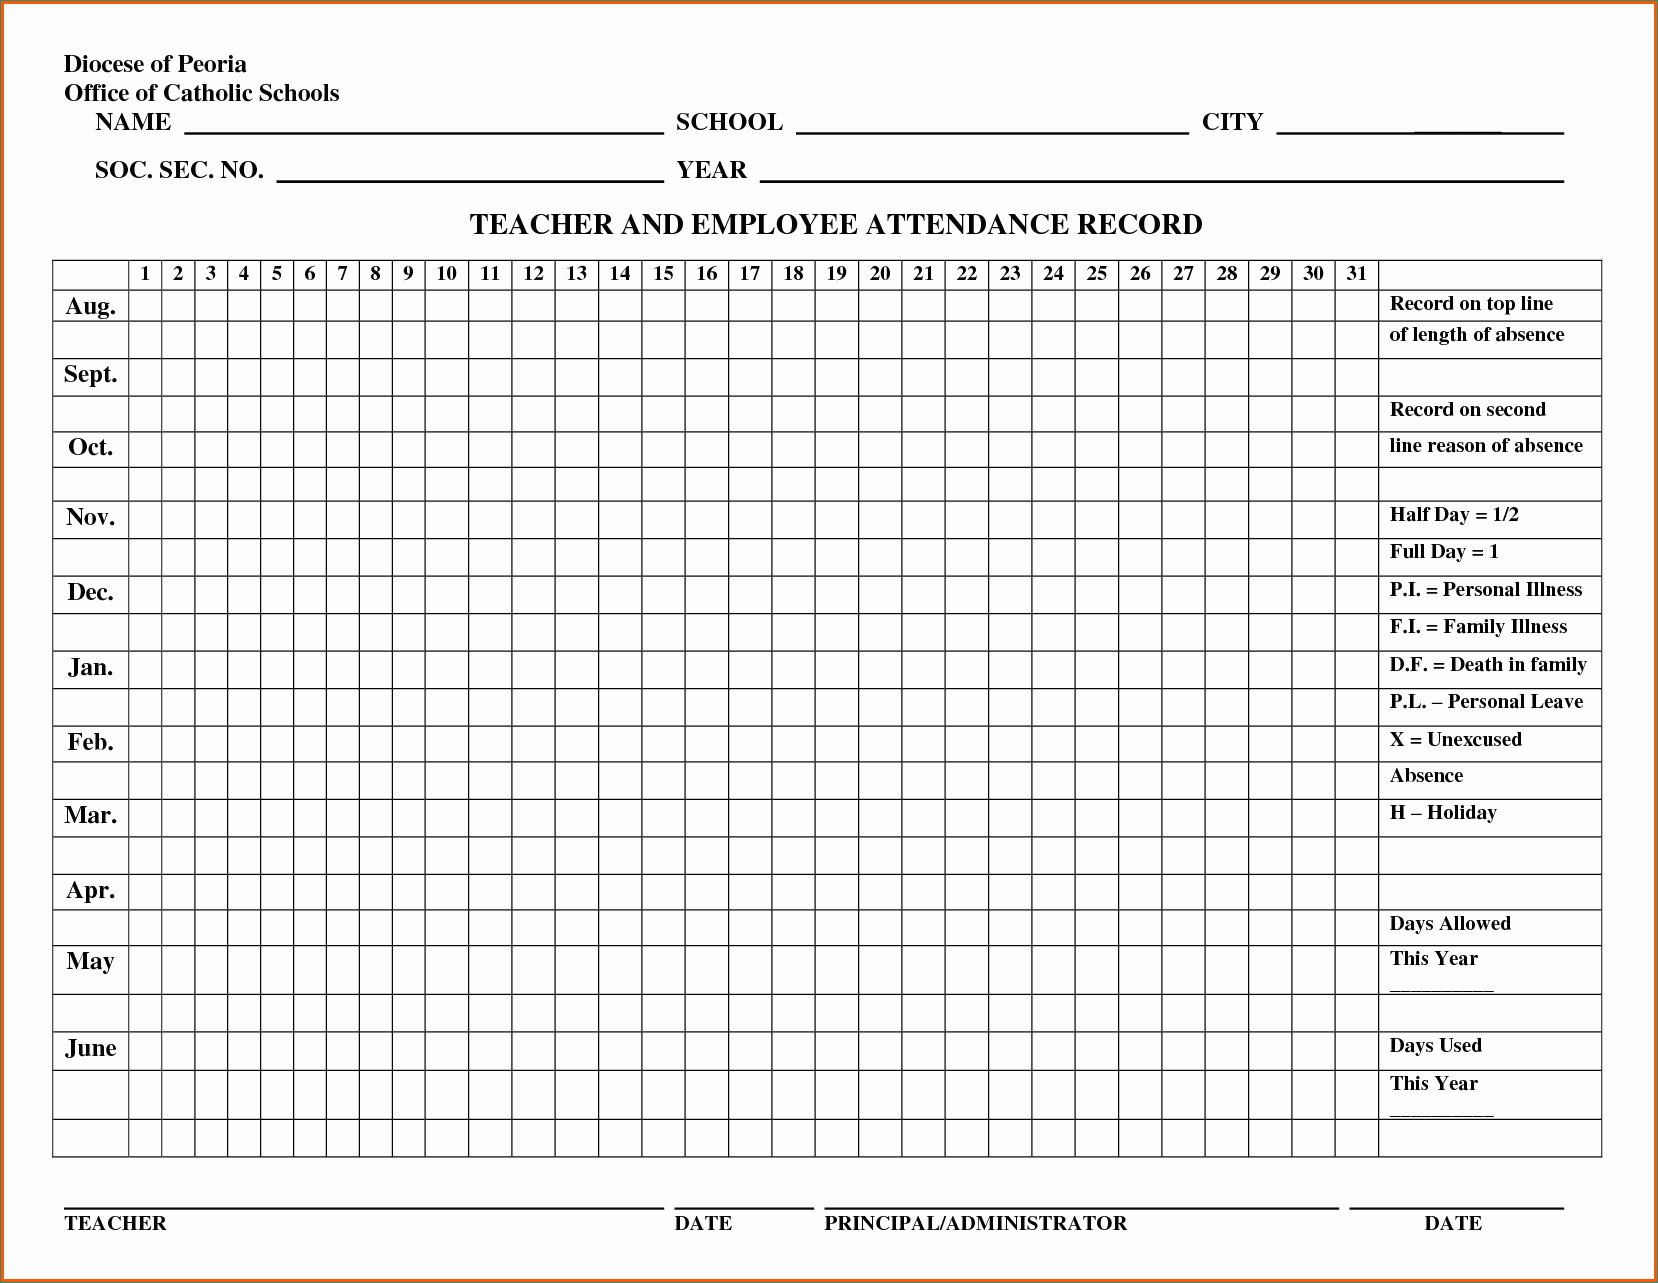 Free Employee Attendance Tracking Spreadsheet Throughout Employee Attendance Records Briliant Employee Attendance Record